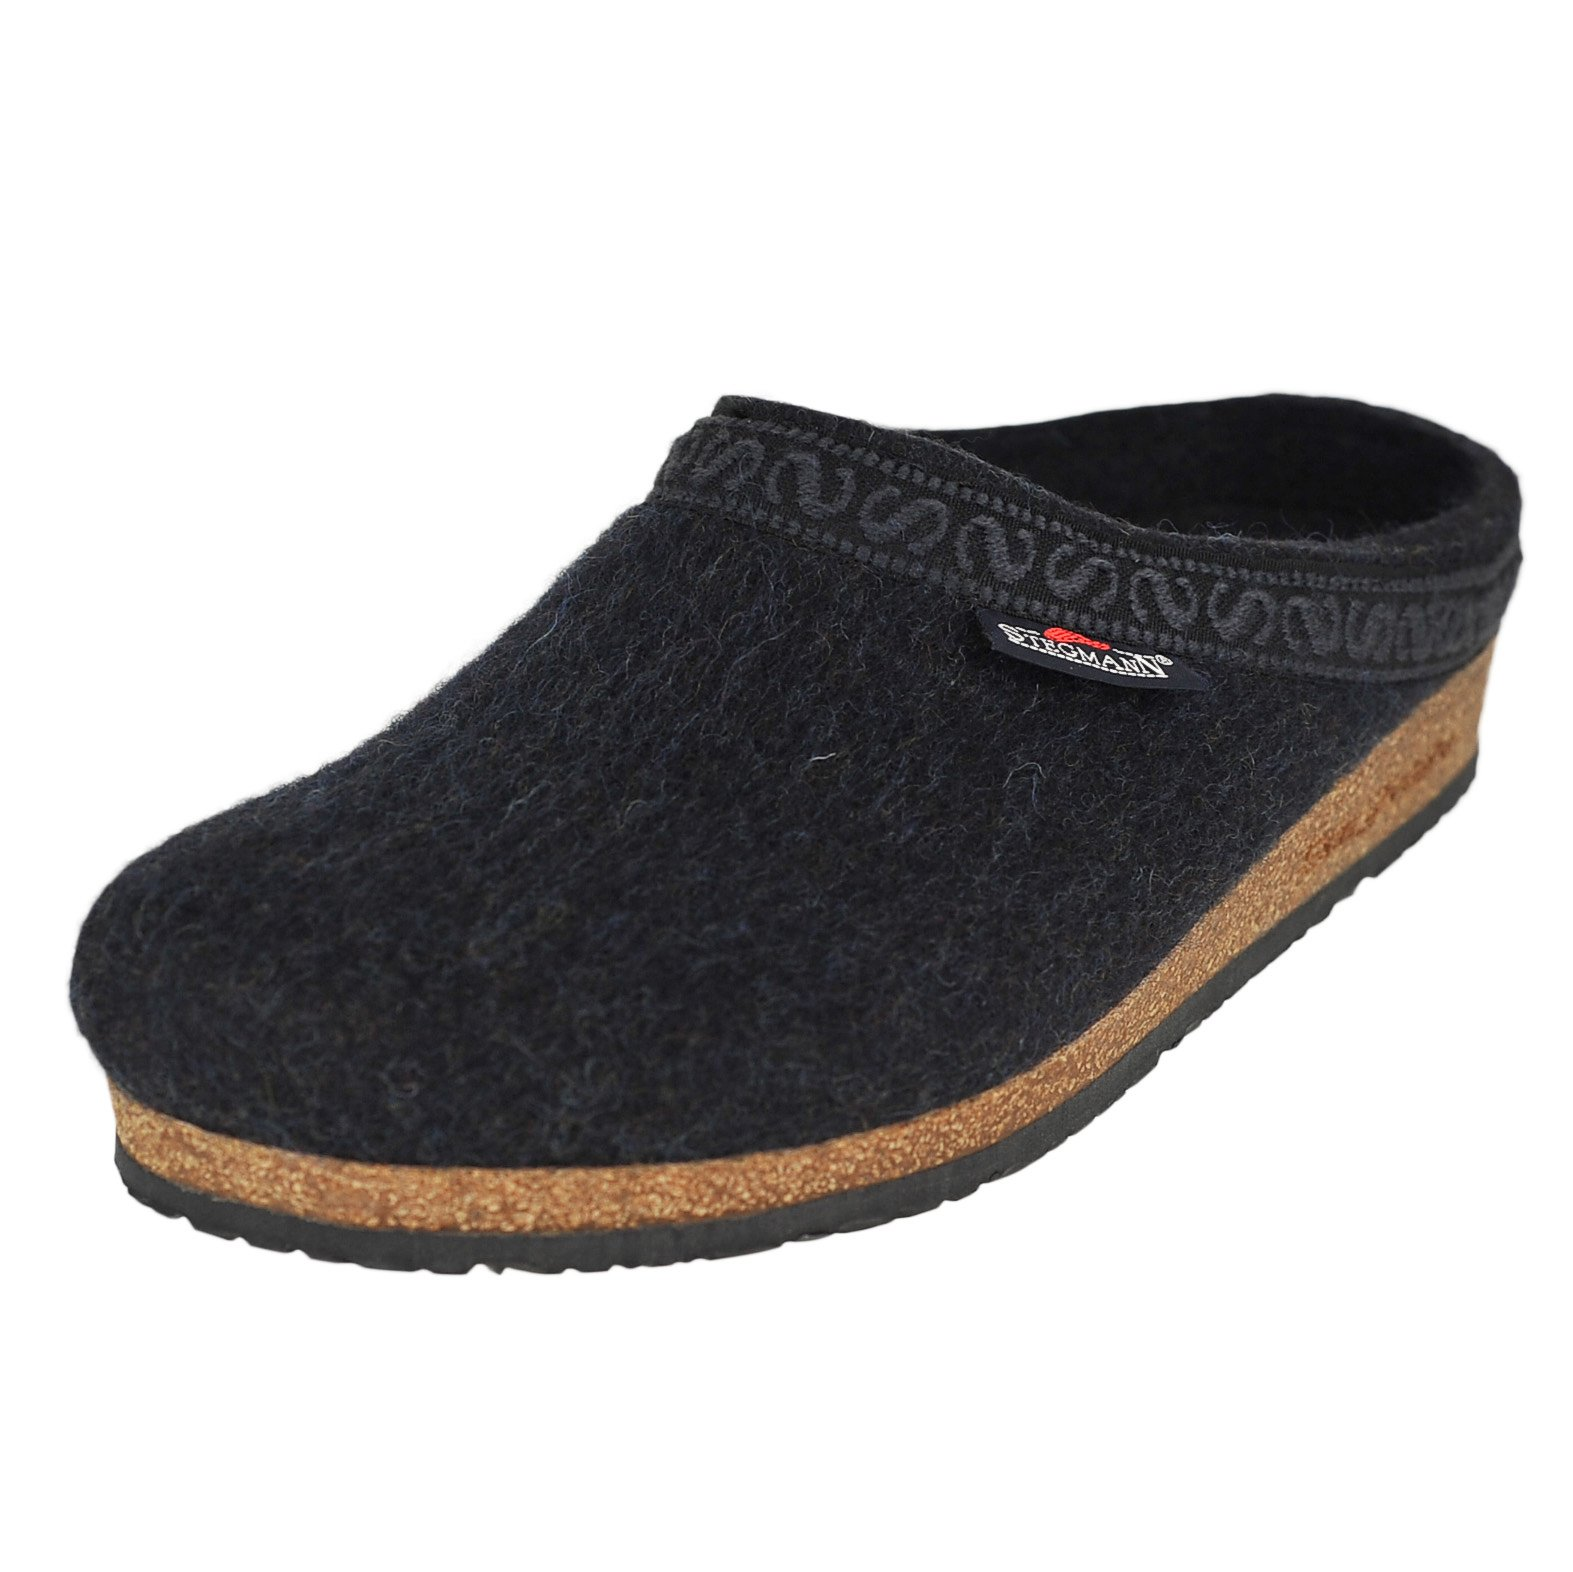 Stegmann New Men's Wool Felt Cork Clog Graphite 10